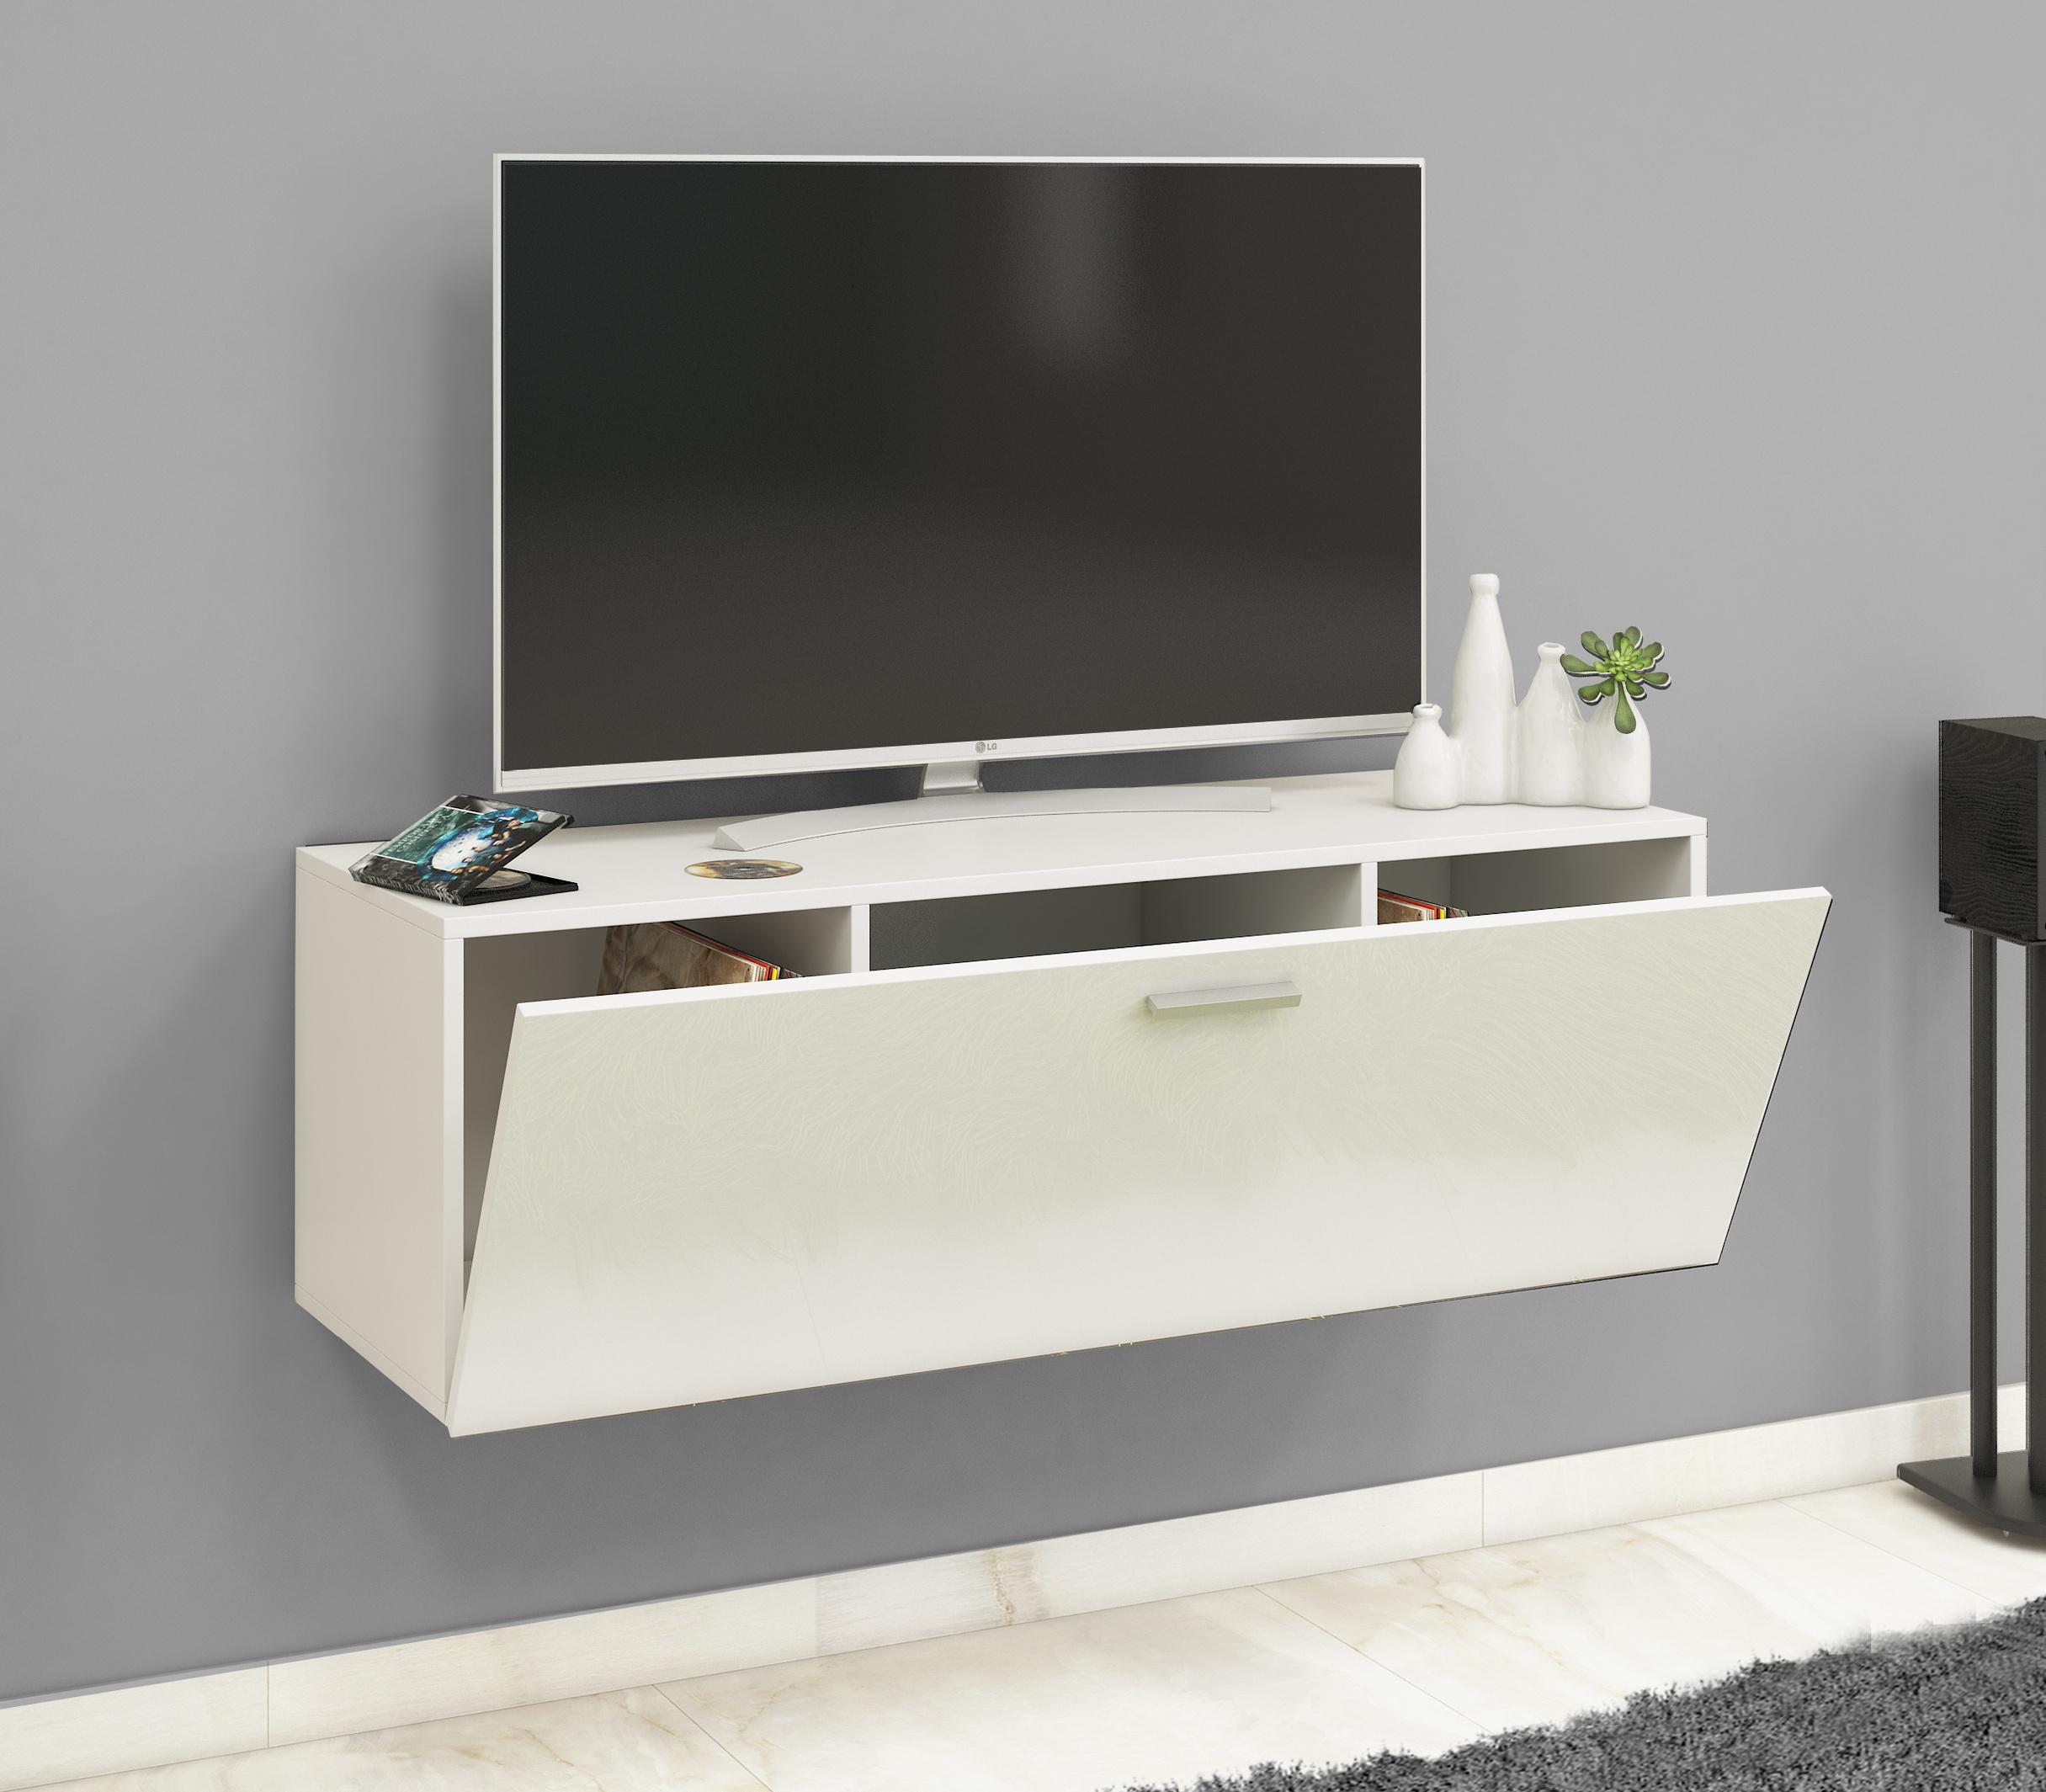 Vcm My Media Tv Wand Board Fernsehtisch Lowboard Wohnwand Regal